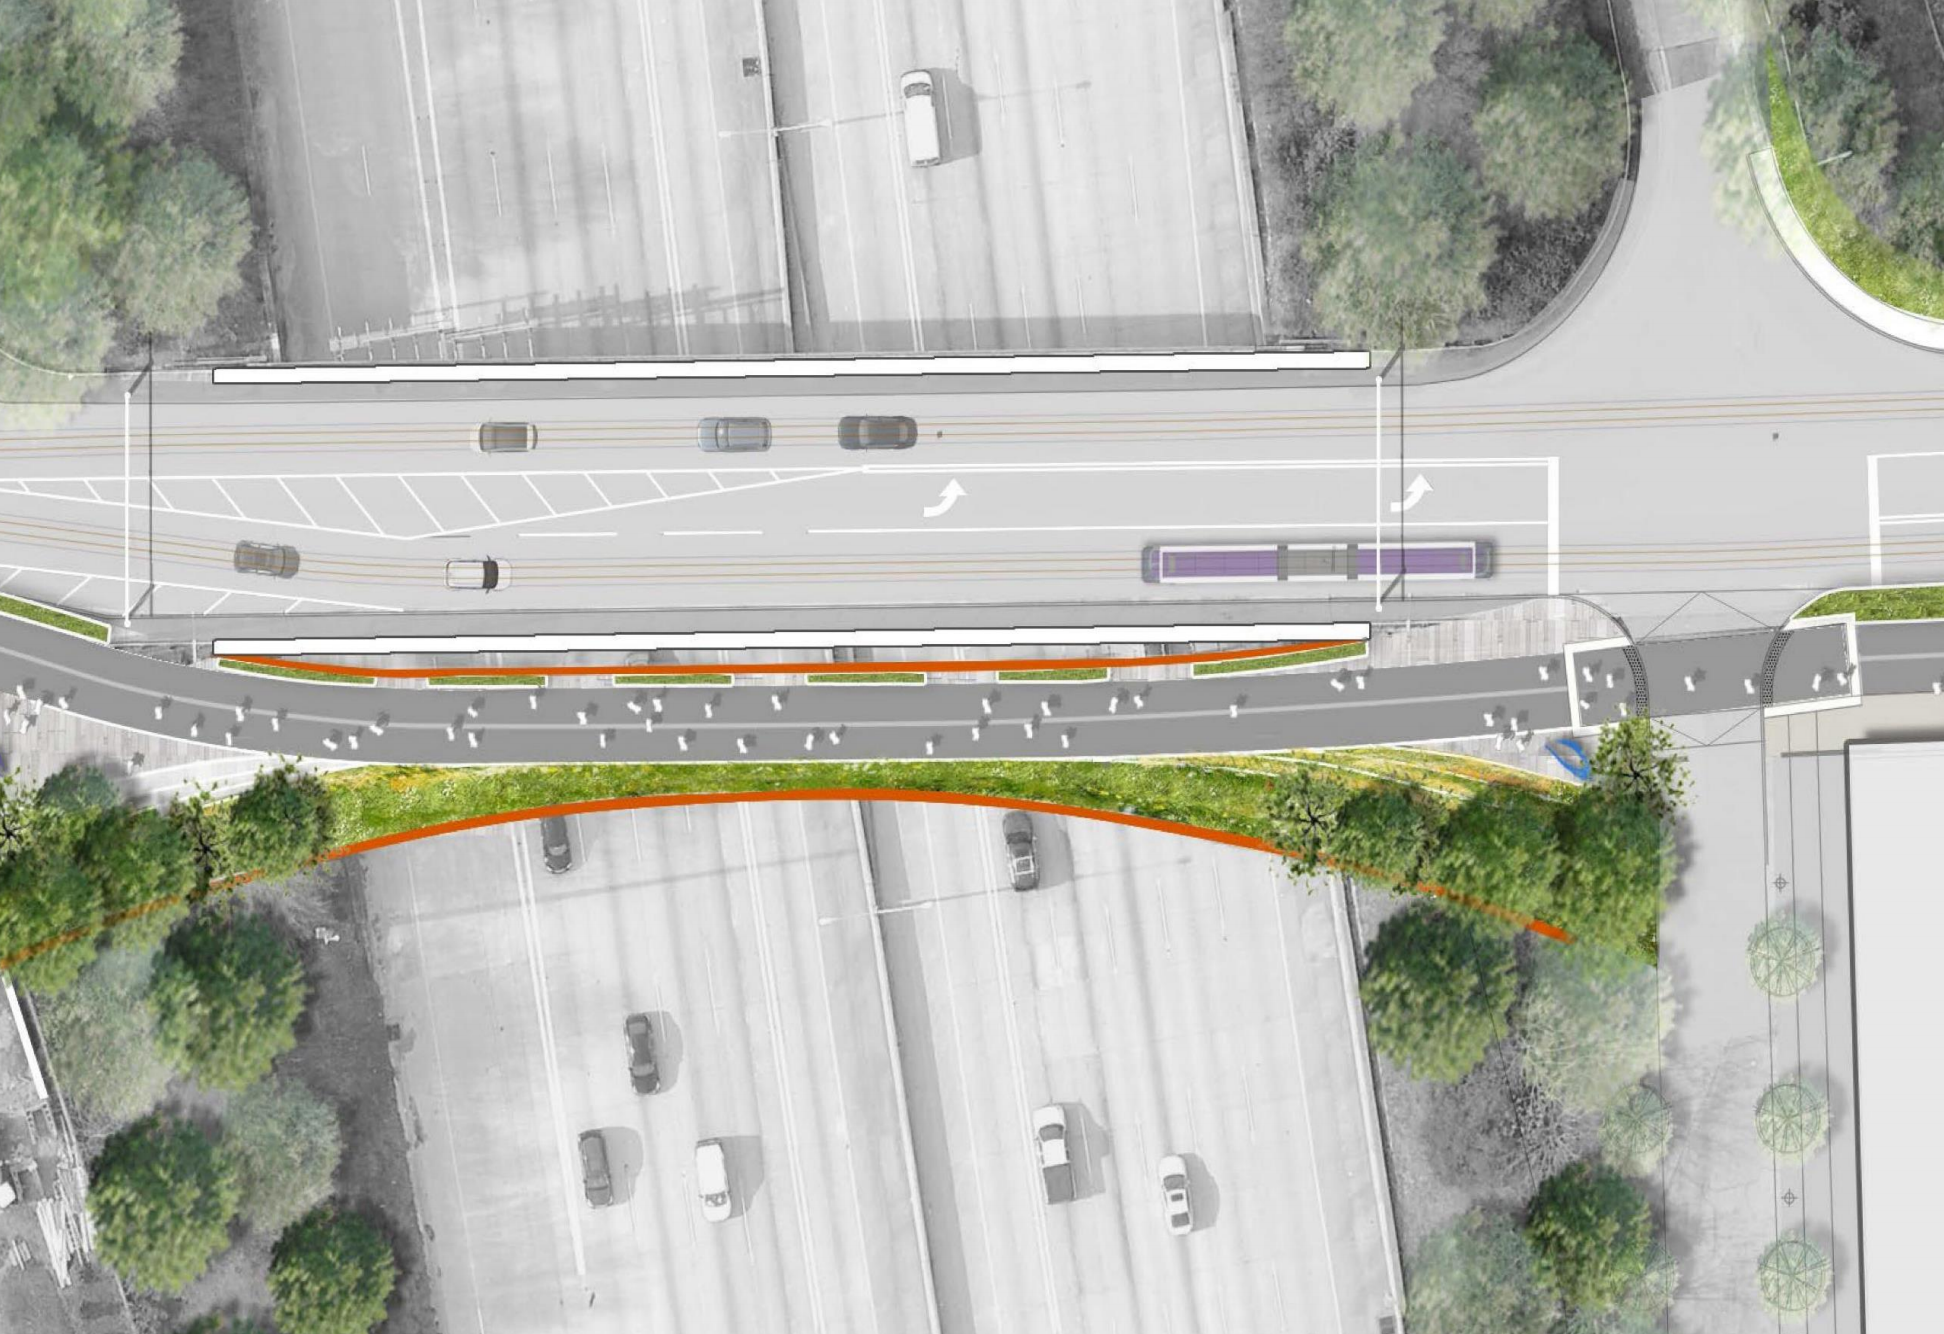 a rendering of the pedestrian bridge